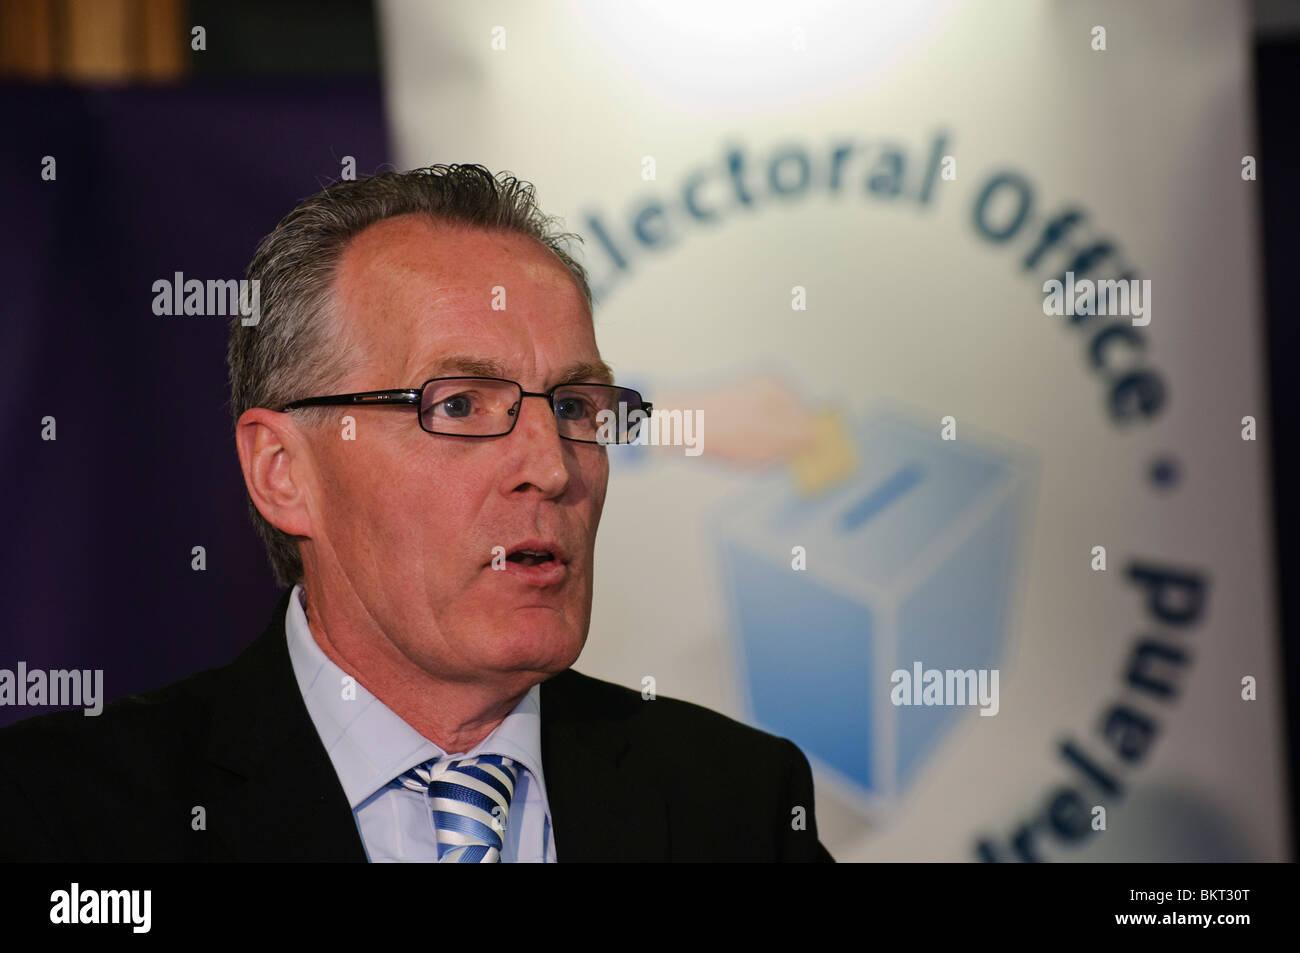 Gerry Kelly, Sinn Fein MLA for Foyle - Stock Image